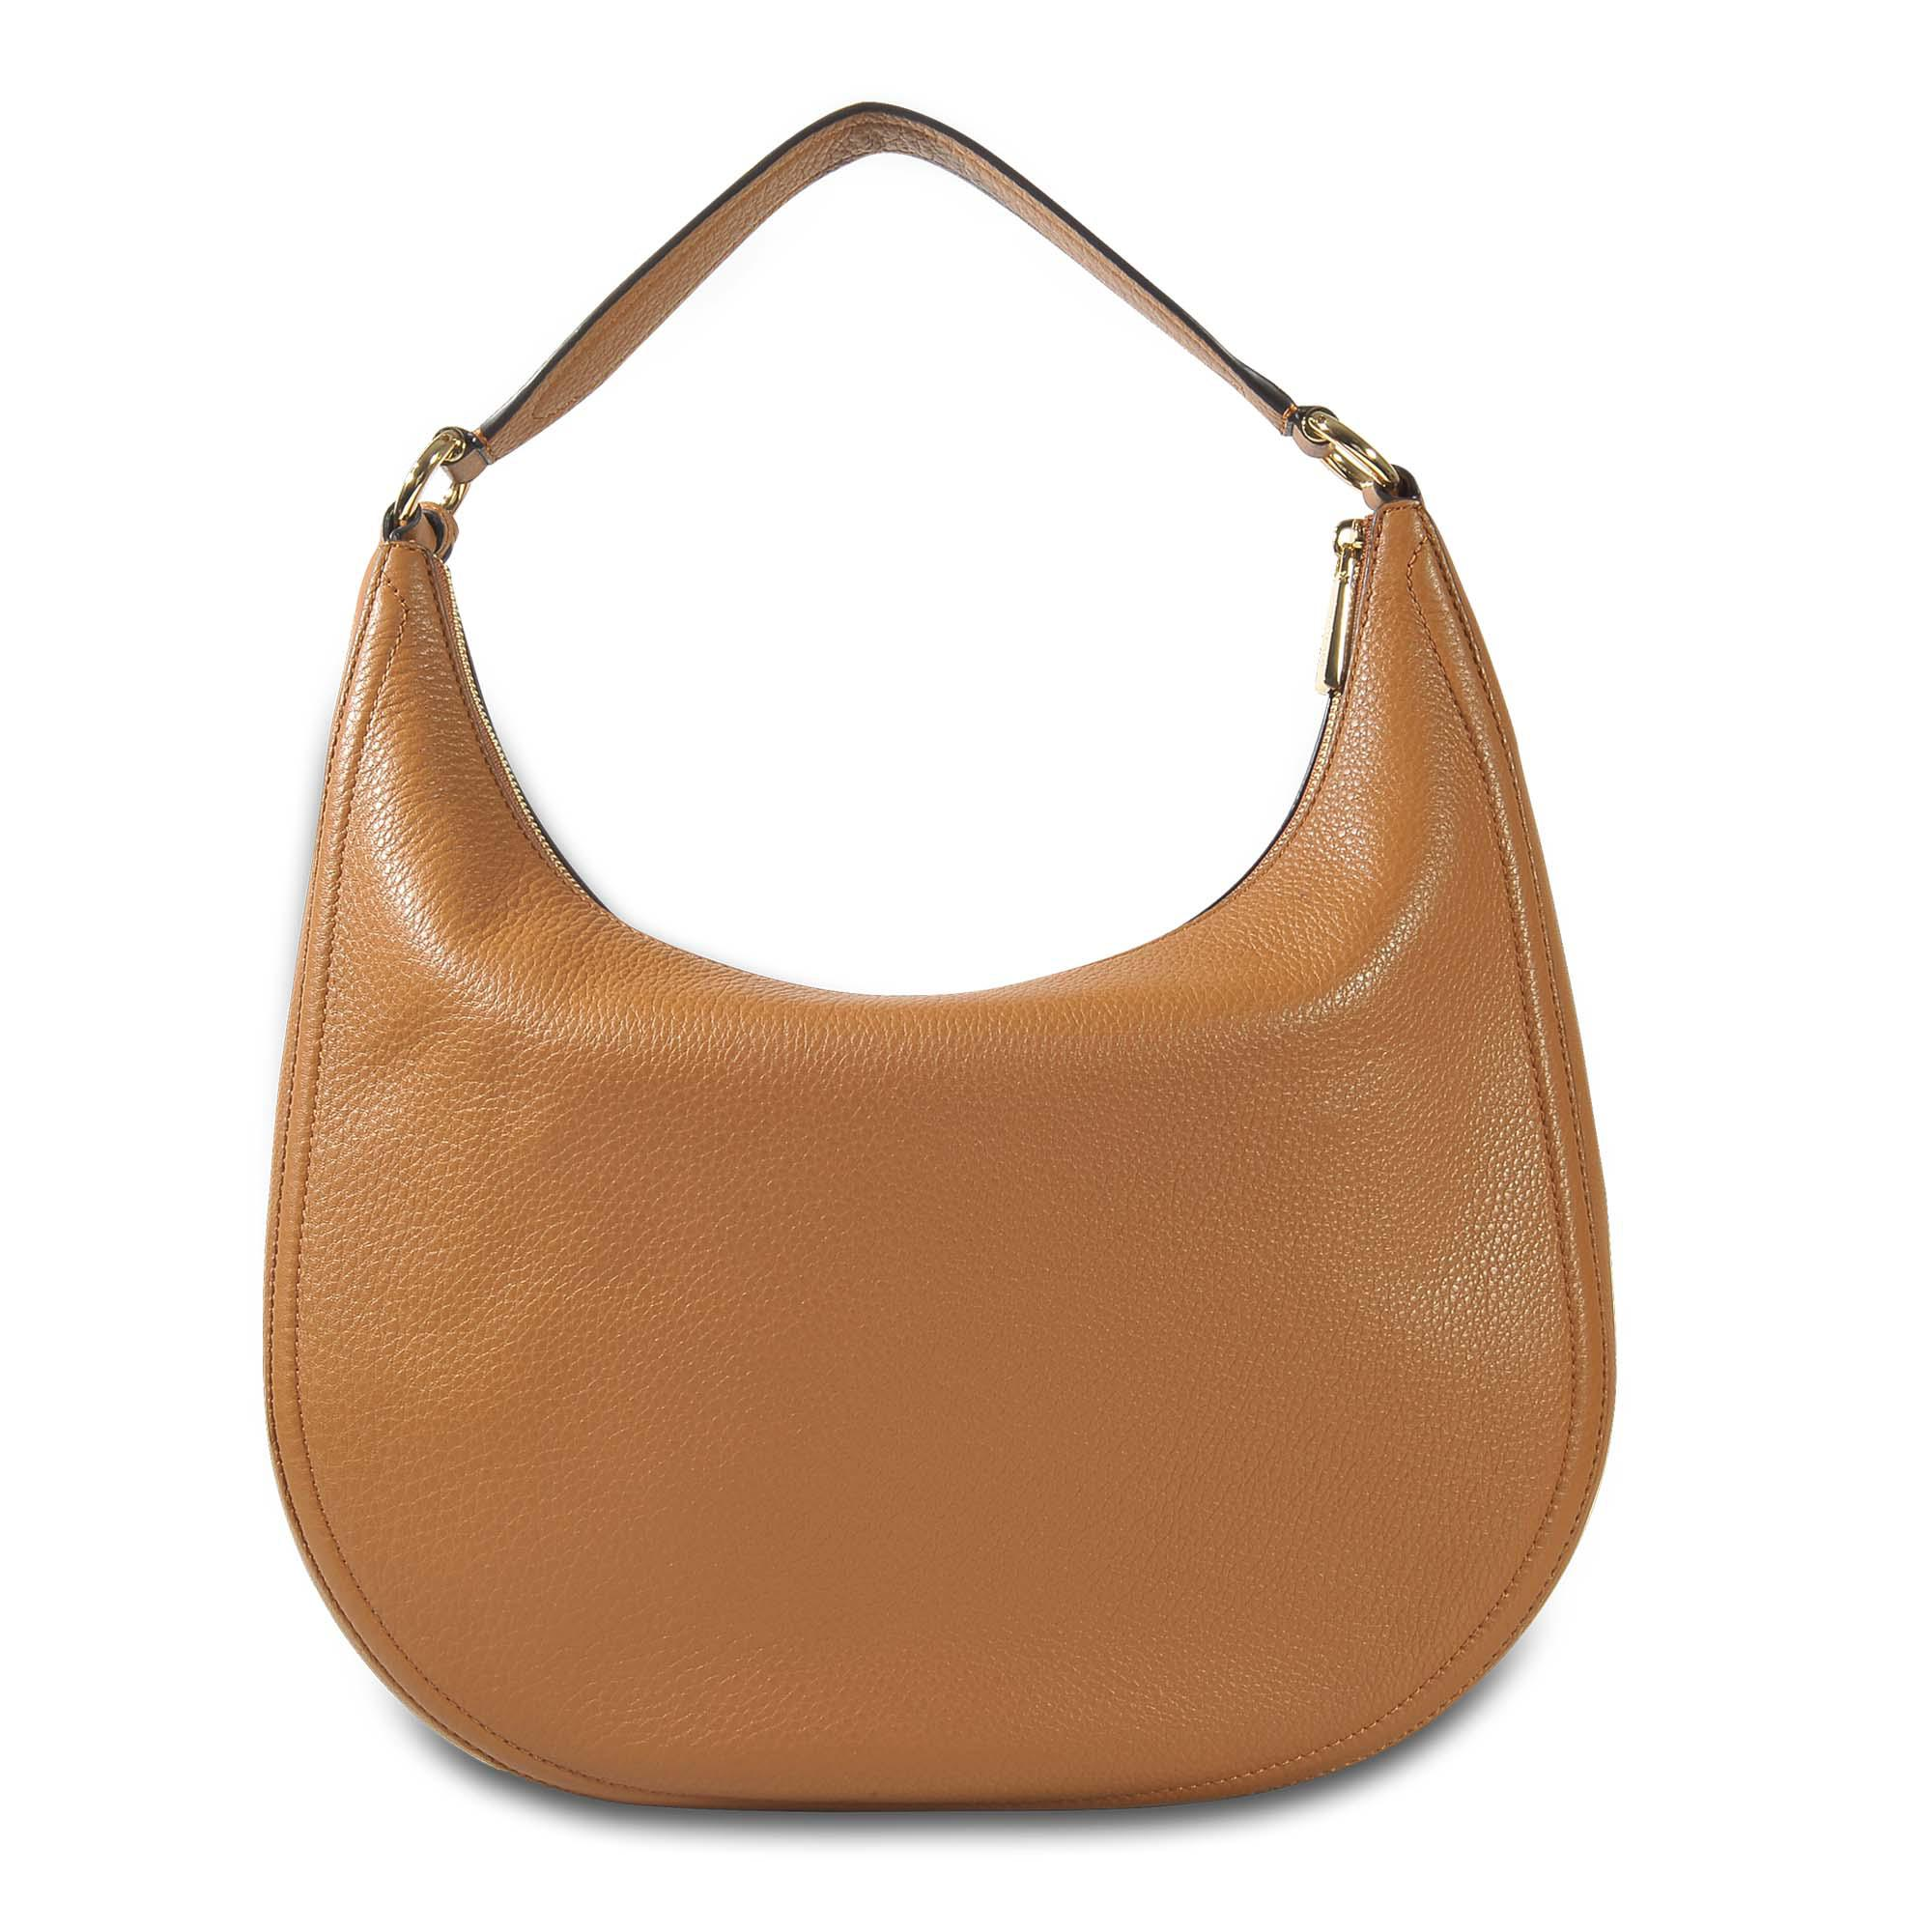 093ebc0a99 Michael Michael Kors Lydia Large Hobo Bag In Acorn Small Pebble ...